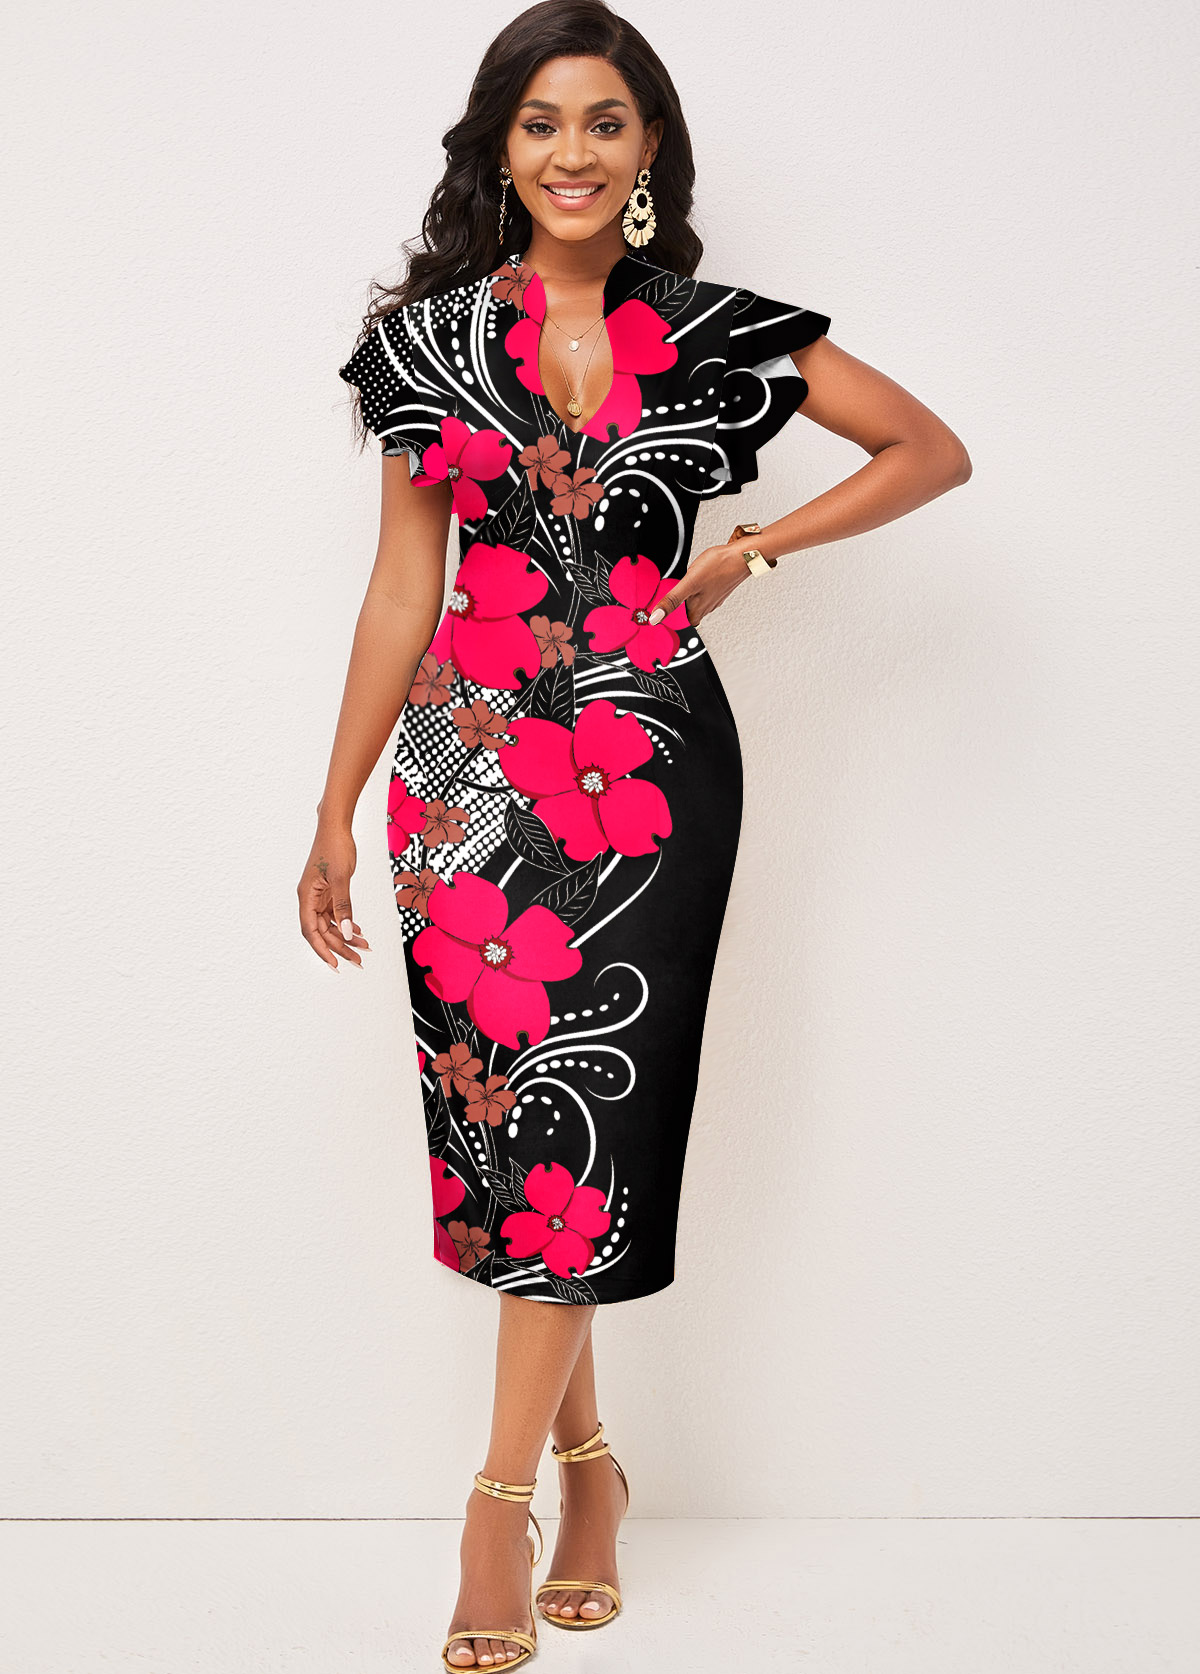 ROTITA Floral Print Contrast Short Sleeve Dress